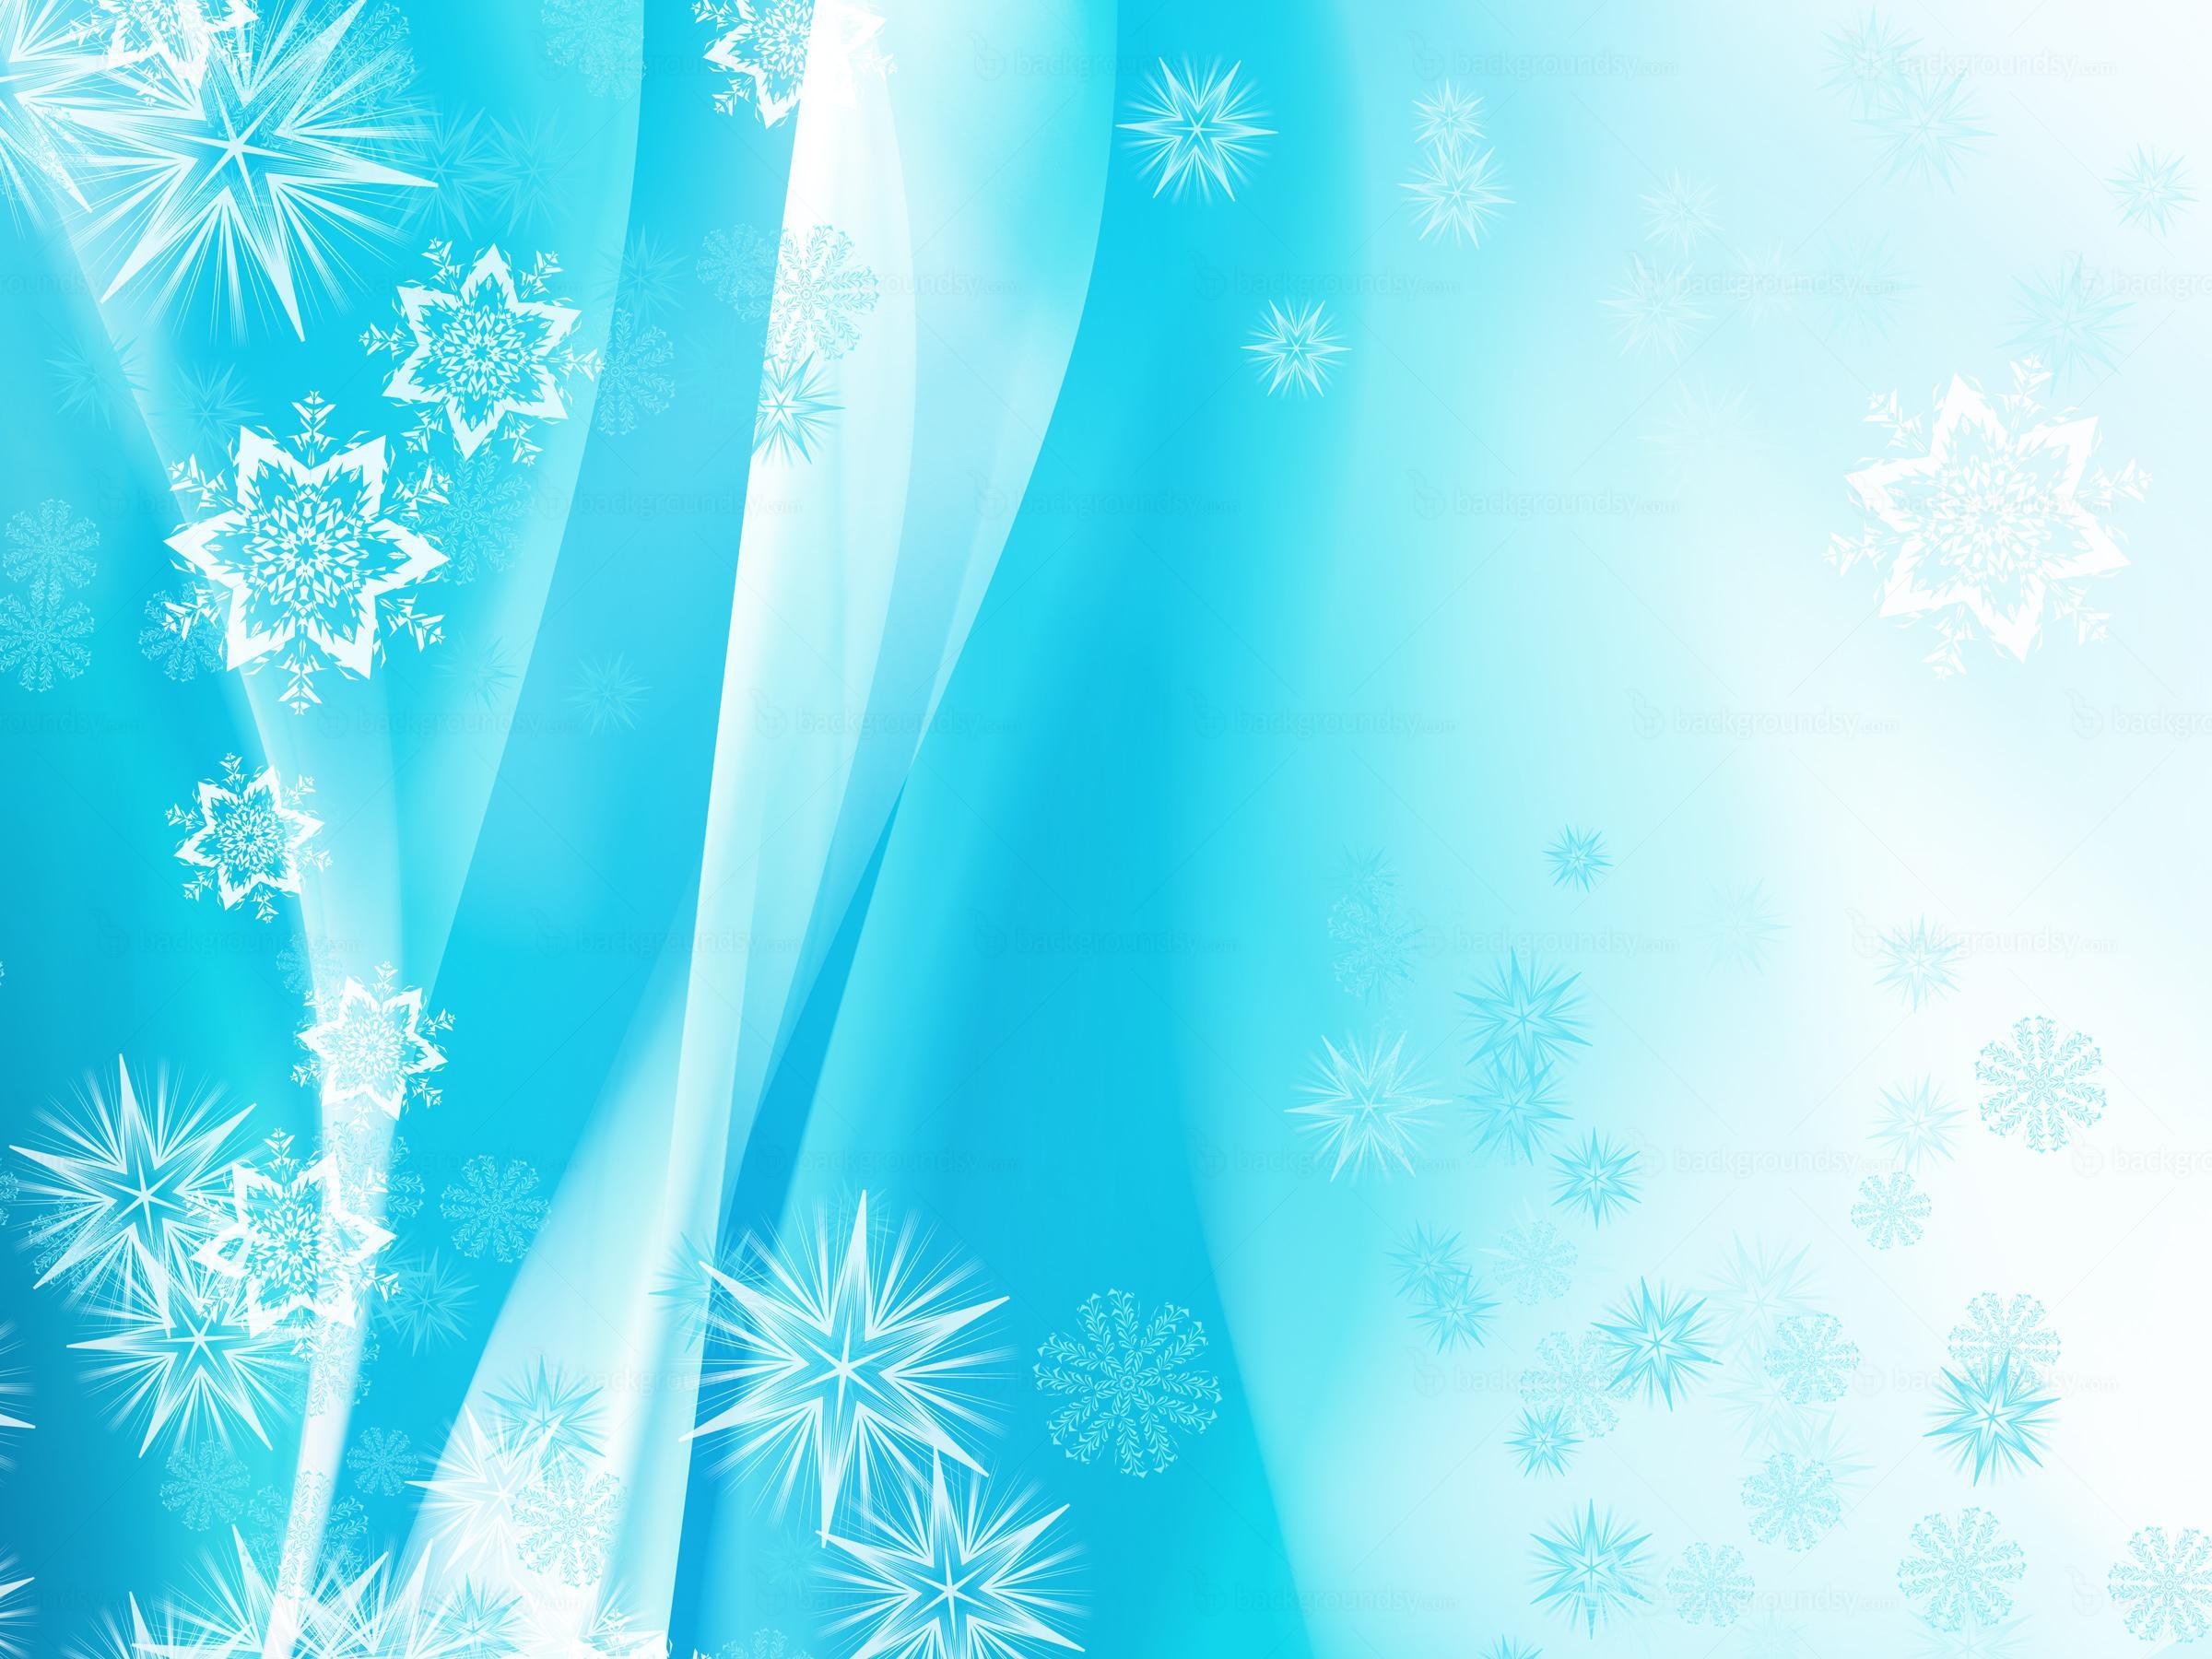 Blue Christmas Art PPT Backgrounds